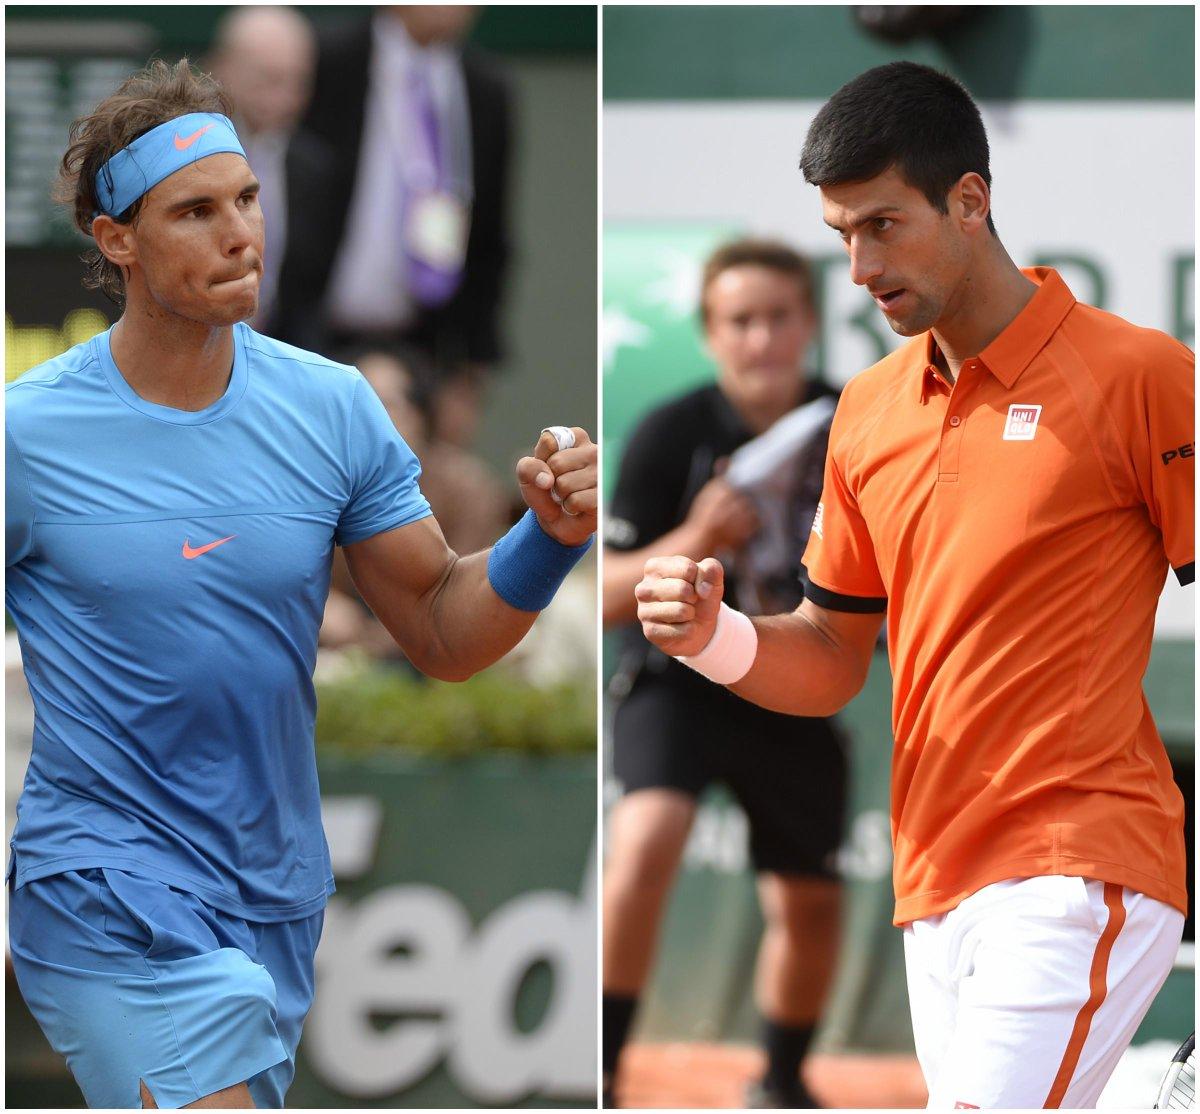 French Open 2015: Sharapova exits but Nadal, Djokovic, Federer advance